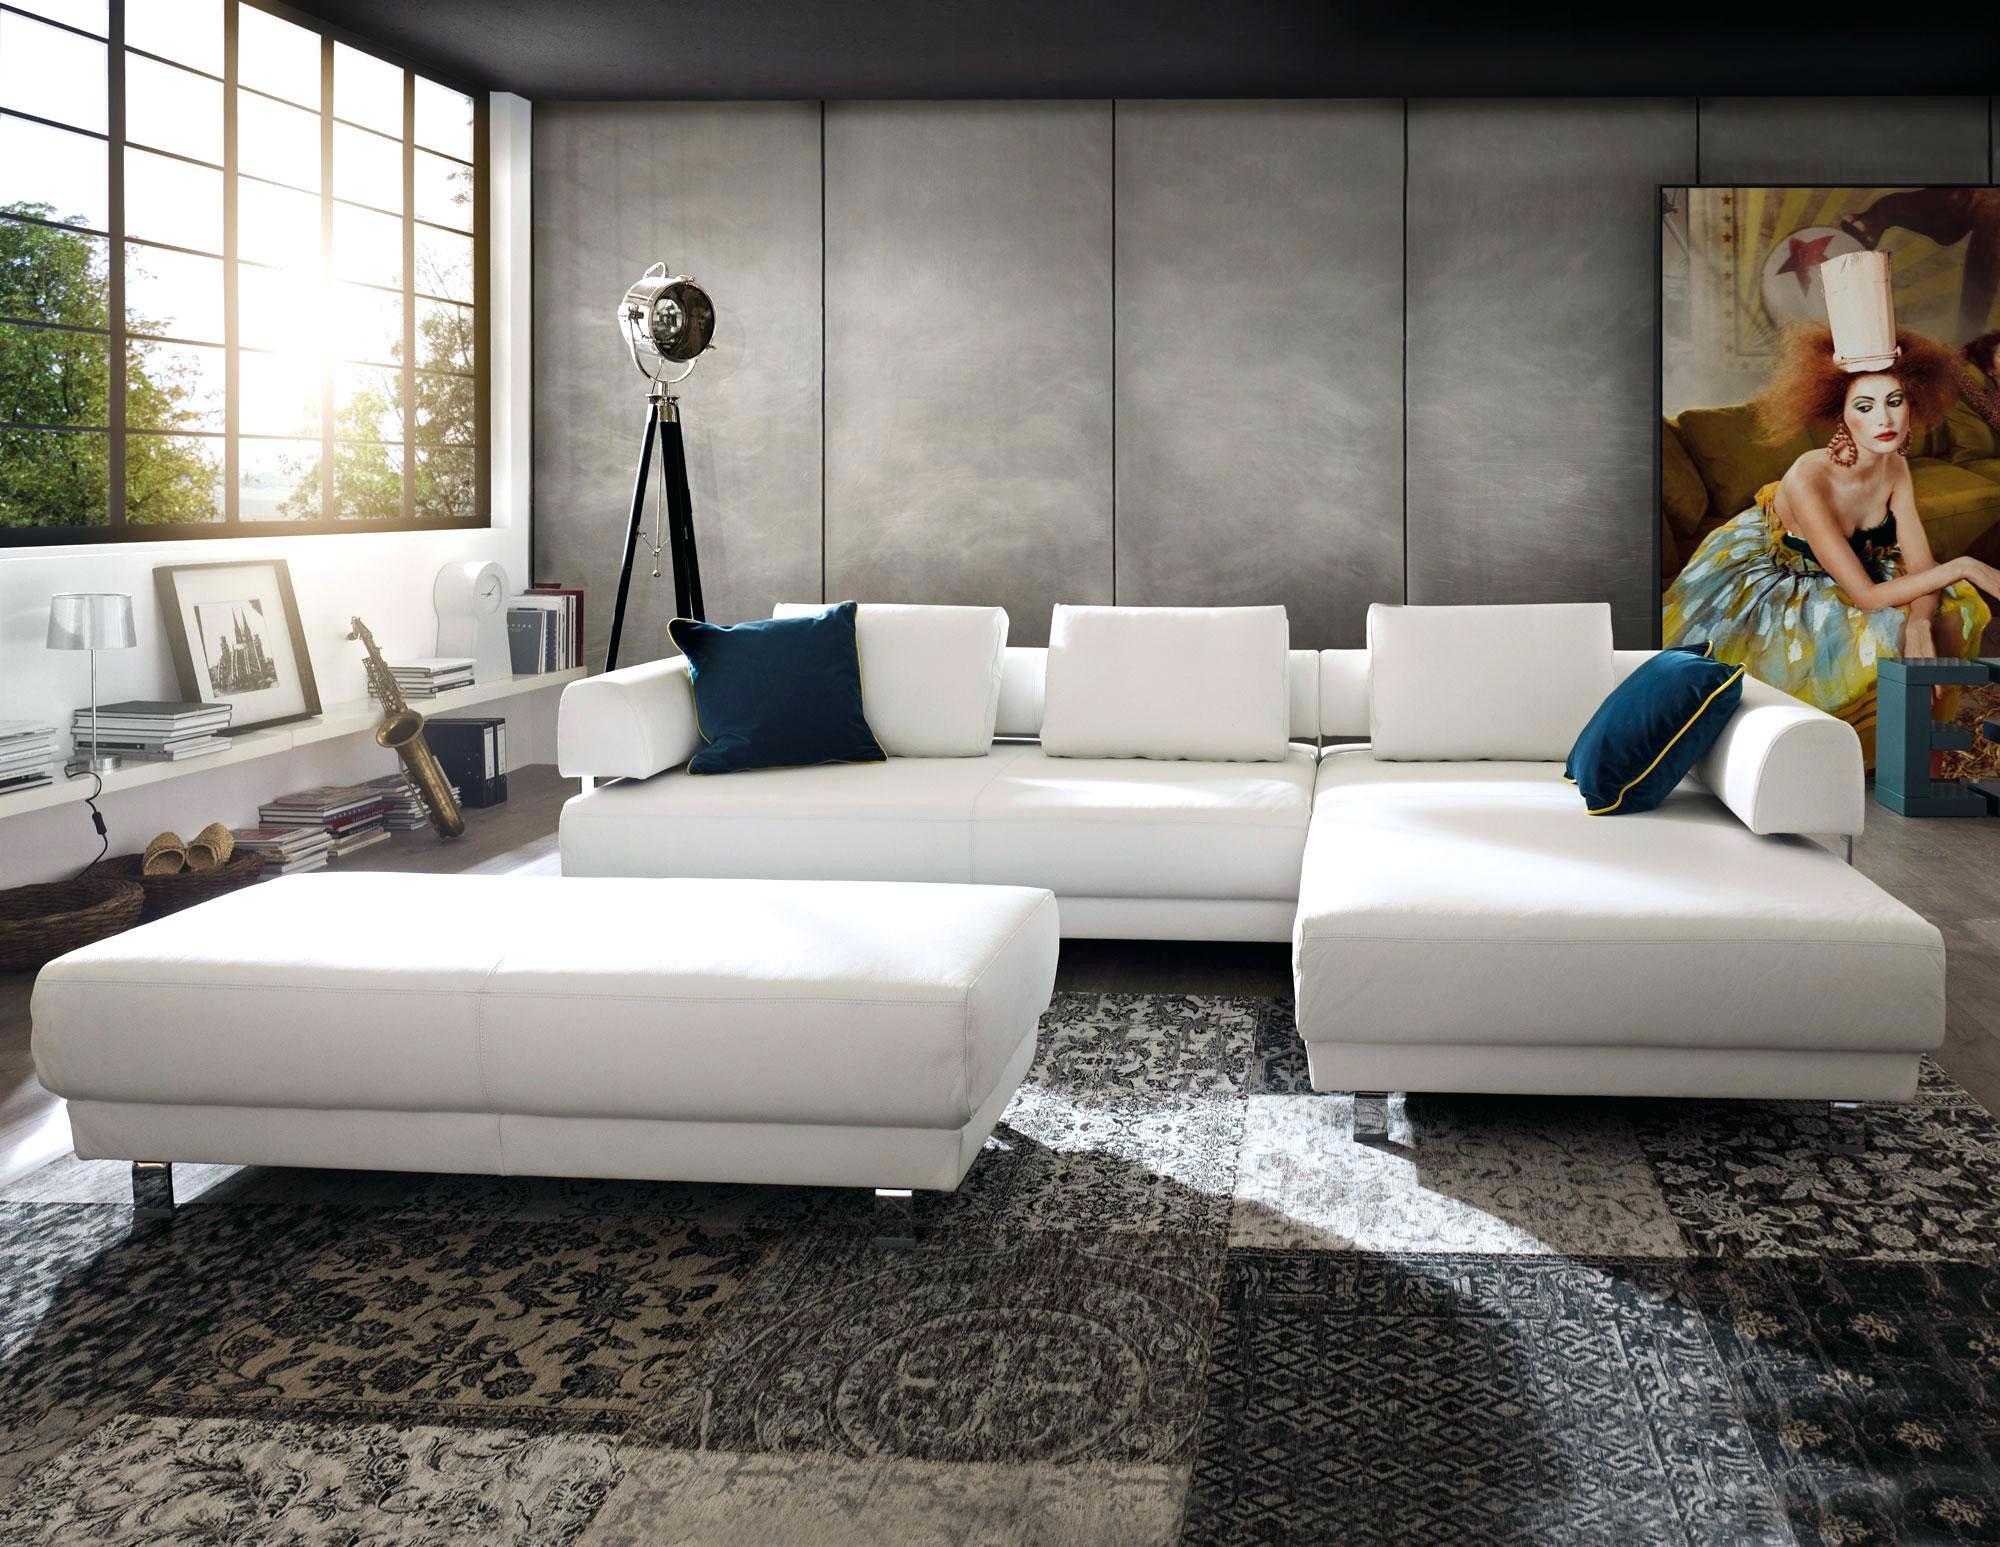 Sofa Reinigen  Sofa Reinigen Fantastisch Sofa Modern Stoff Grau Jjectfo